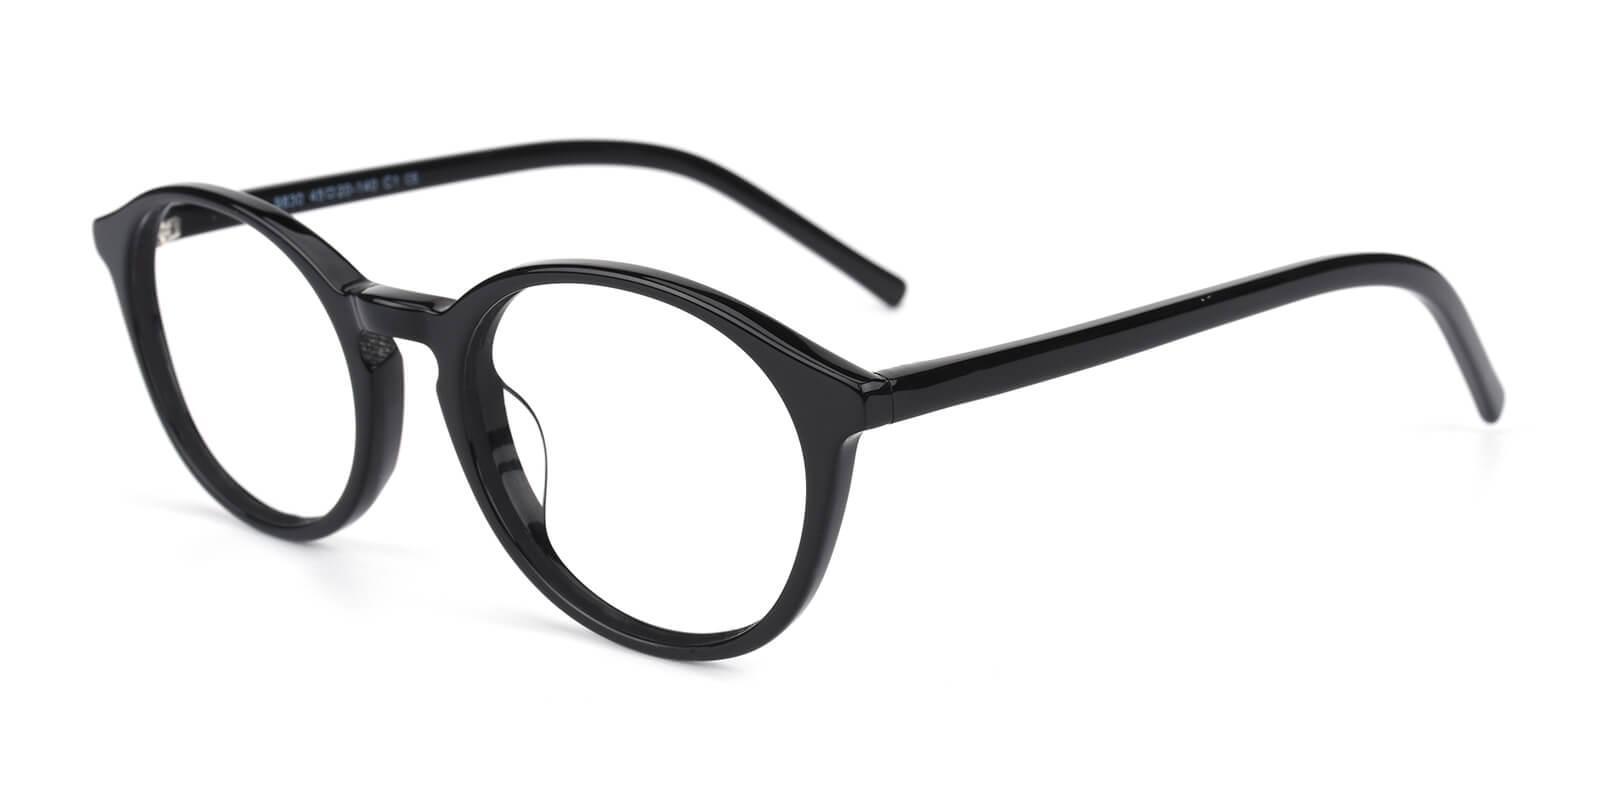 Herbel-Black-Round-Acetate-Eyeglasses-detail